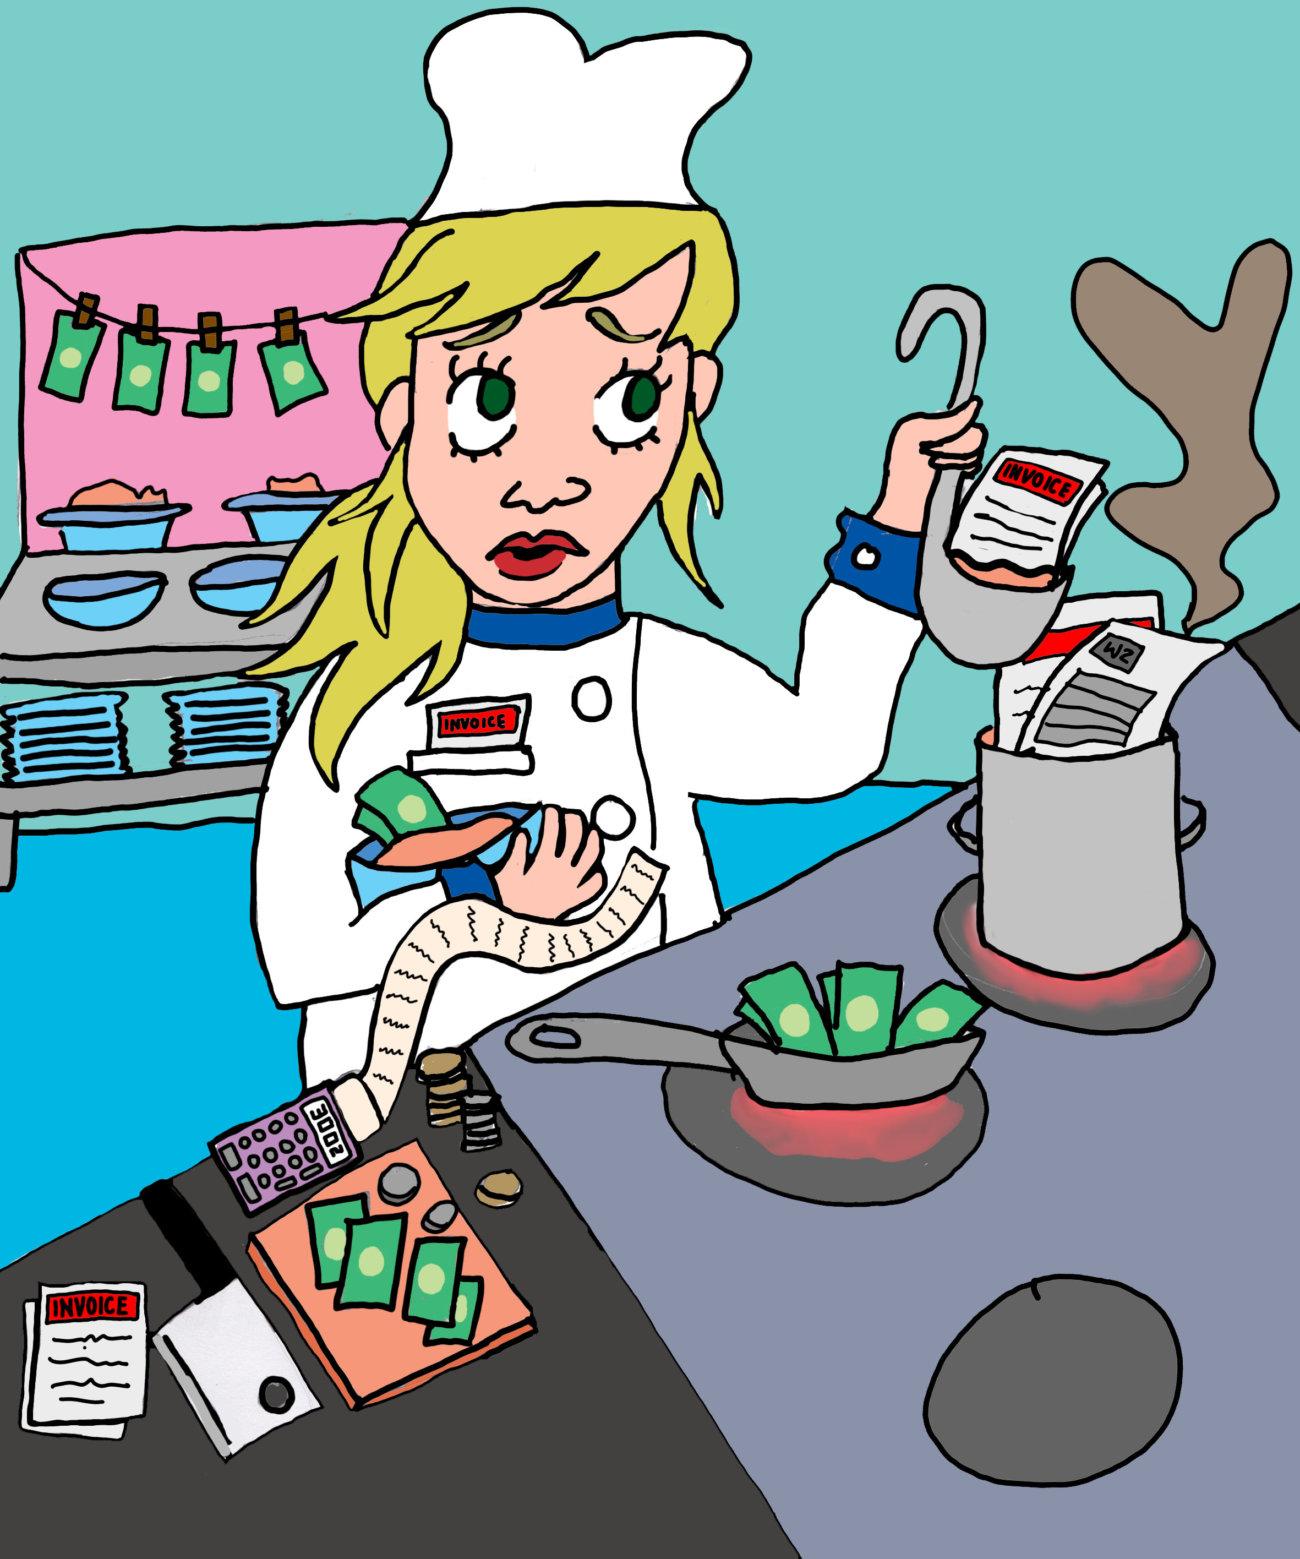 cartoon depicting chef